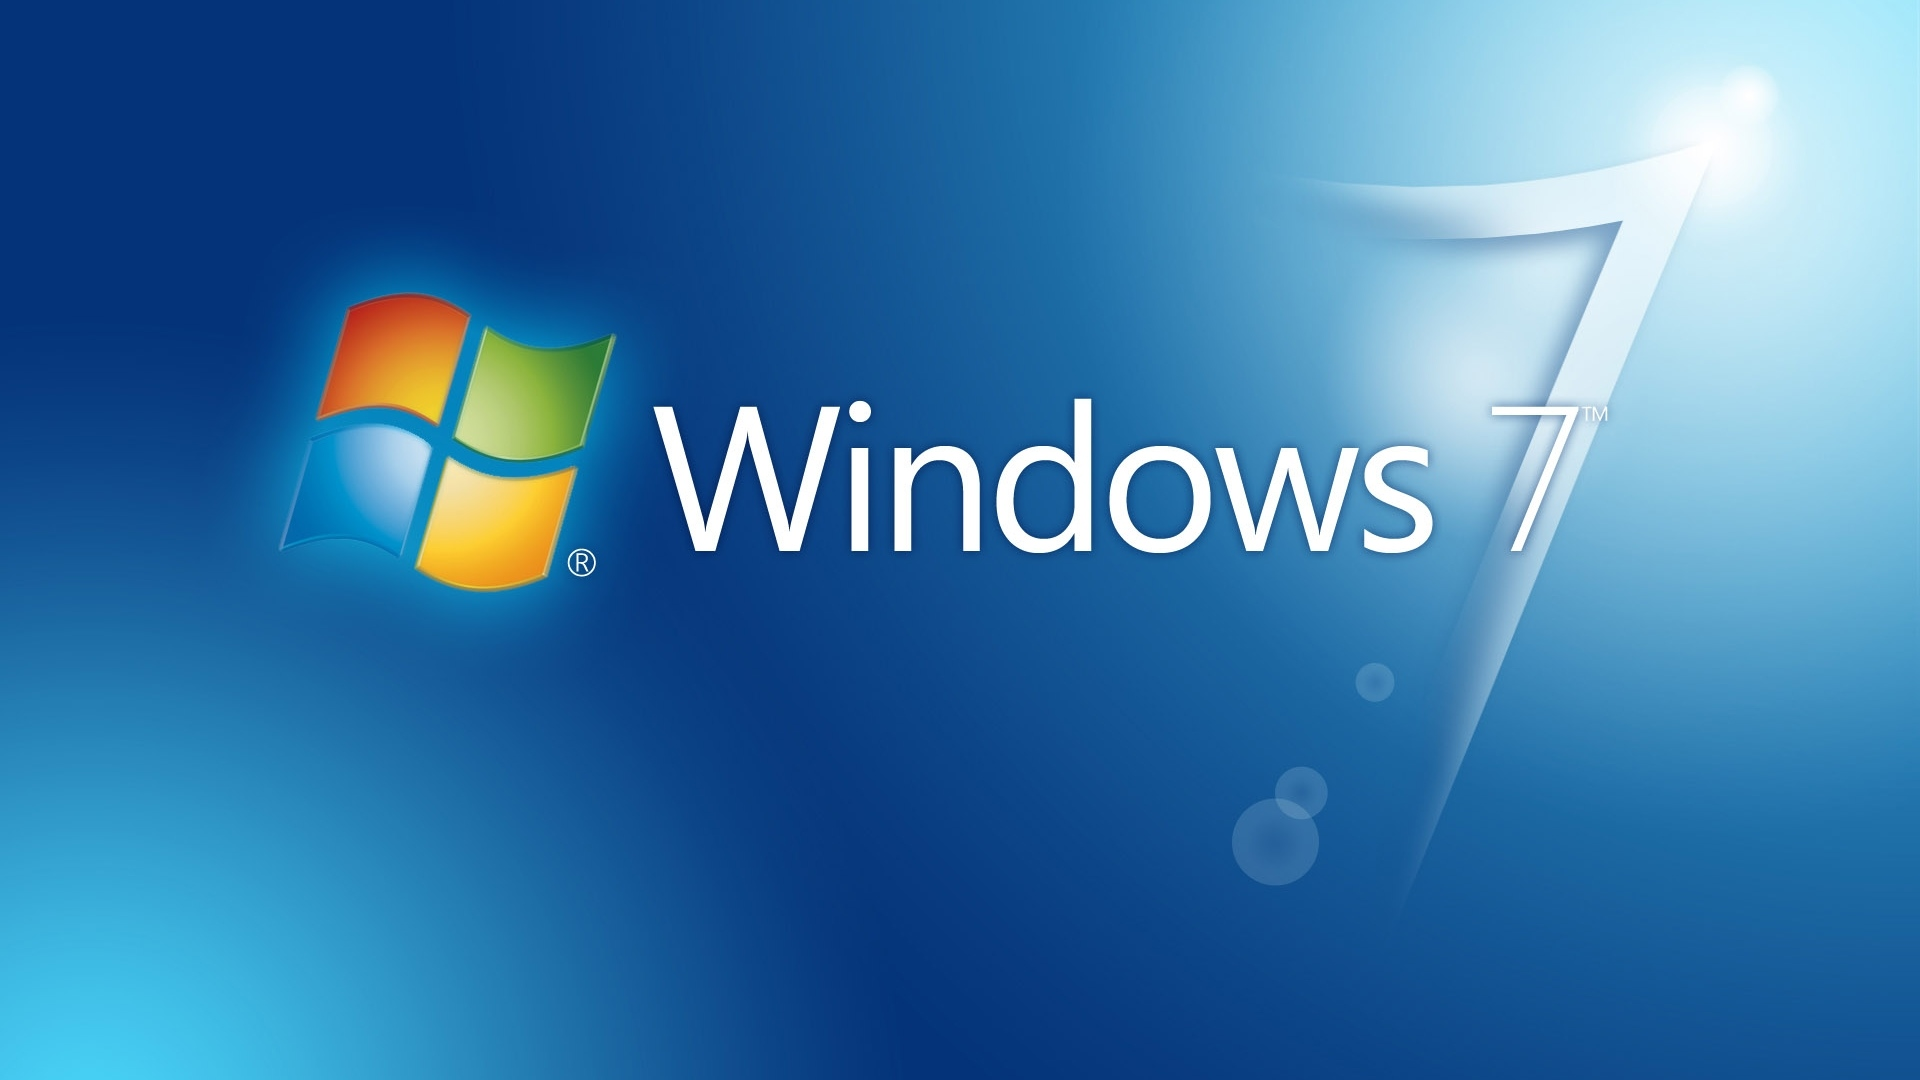 Full HD 1080p Windows 7 Wallpapers HD, Desktop Backgrounds